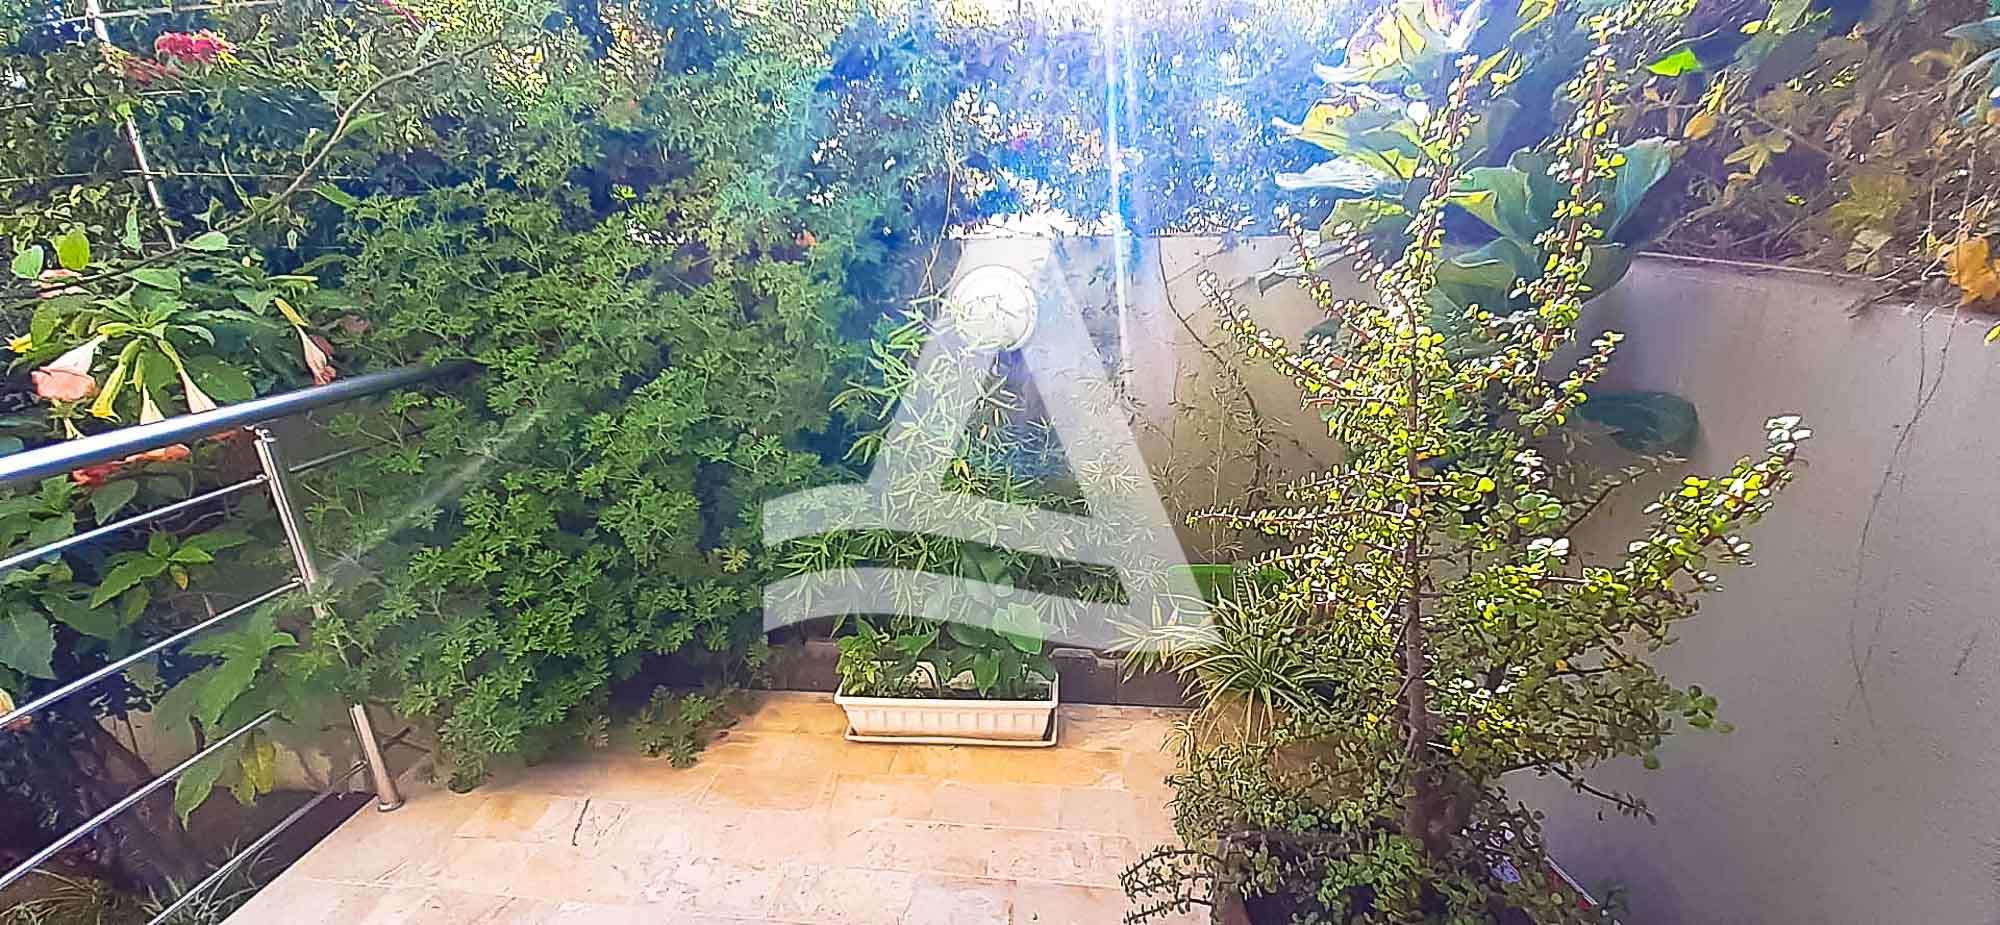 httpss3.amazonaws.comlogimoaws_Arcane_immobilière_la_Marsa-_location_-_vente_la_marsa_1_sur_12_1574441790445